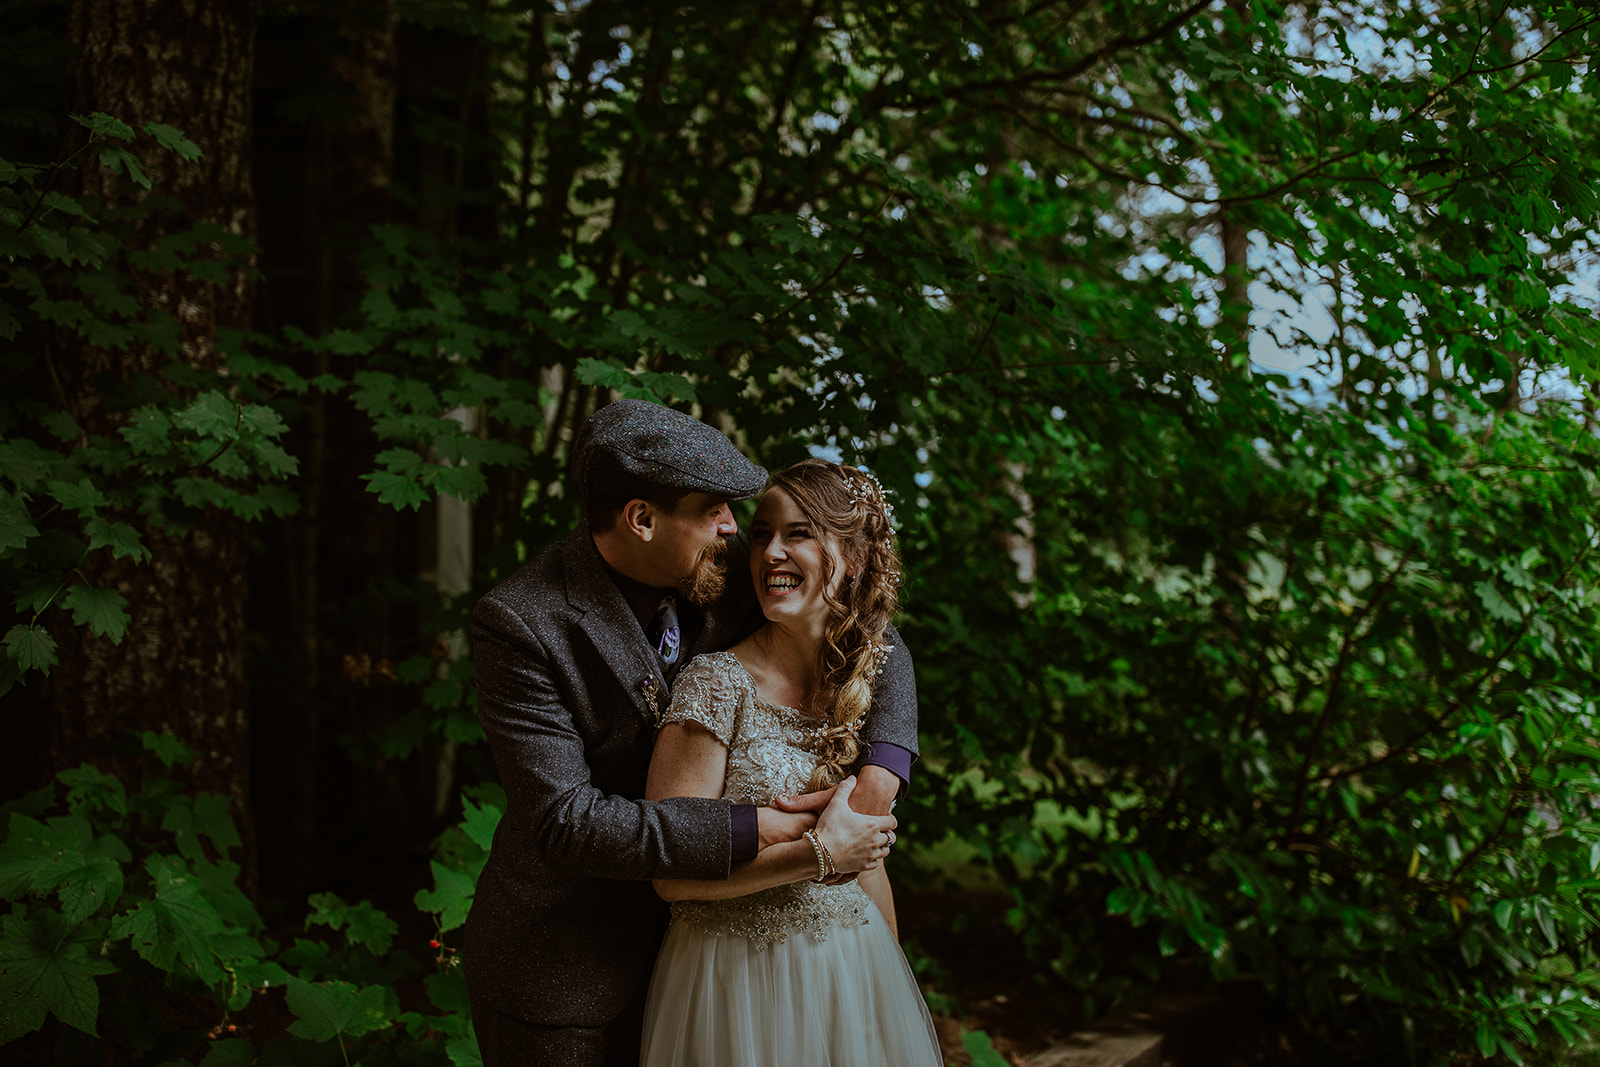 mount-rainier-cabin-elopement-megan-gallagher-photography_(115_of_568).jpg